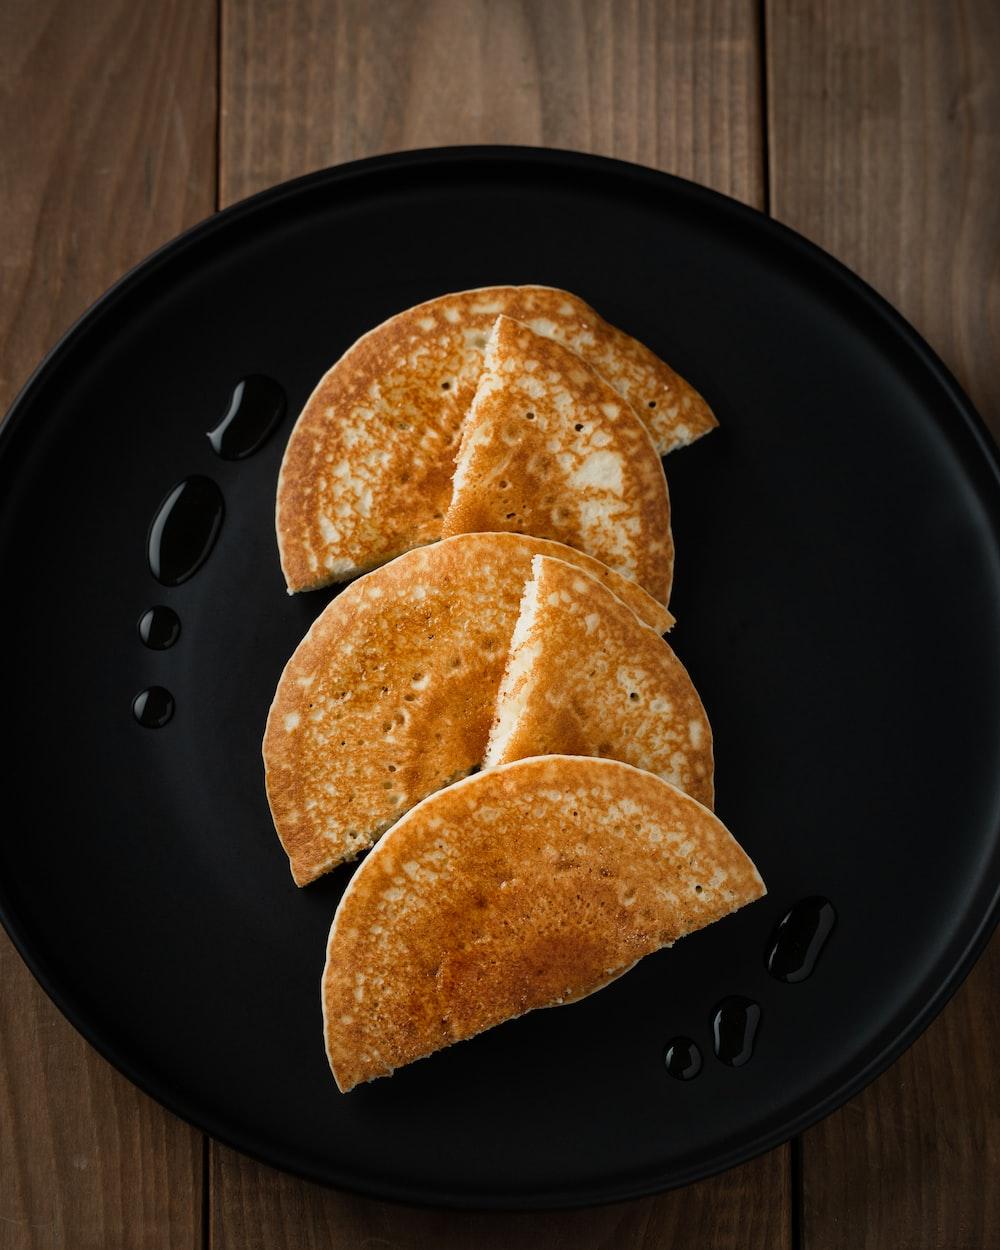 sliced pancakes on plate